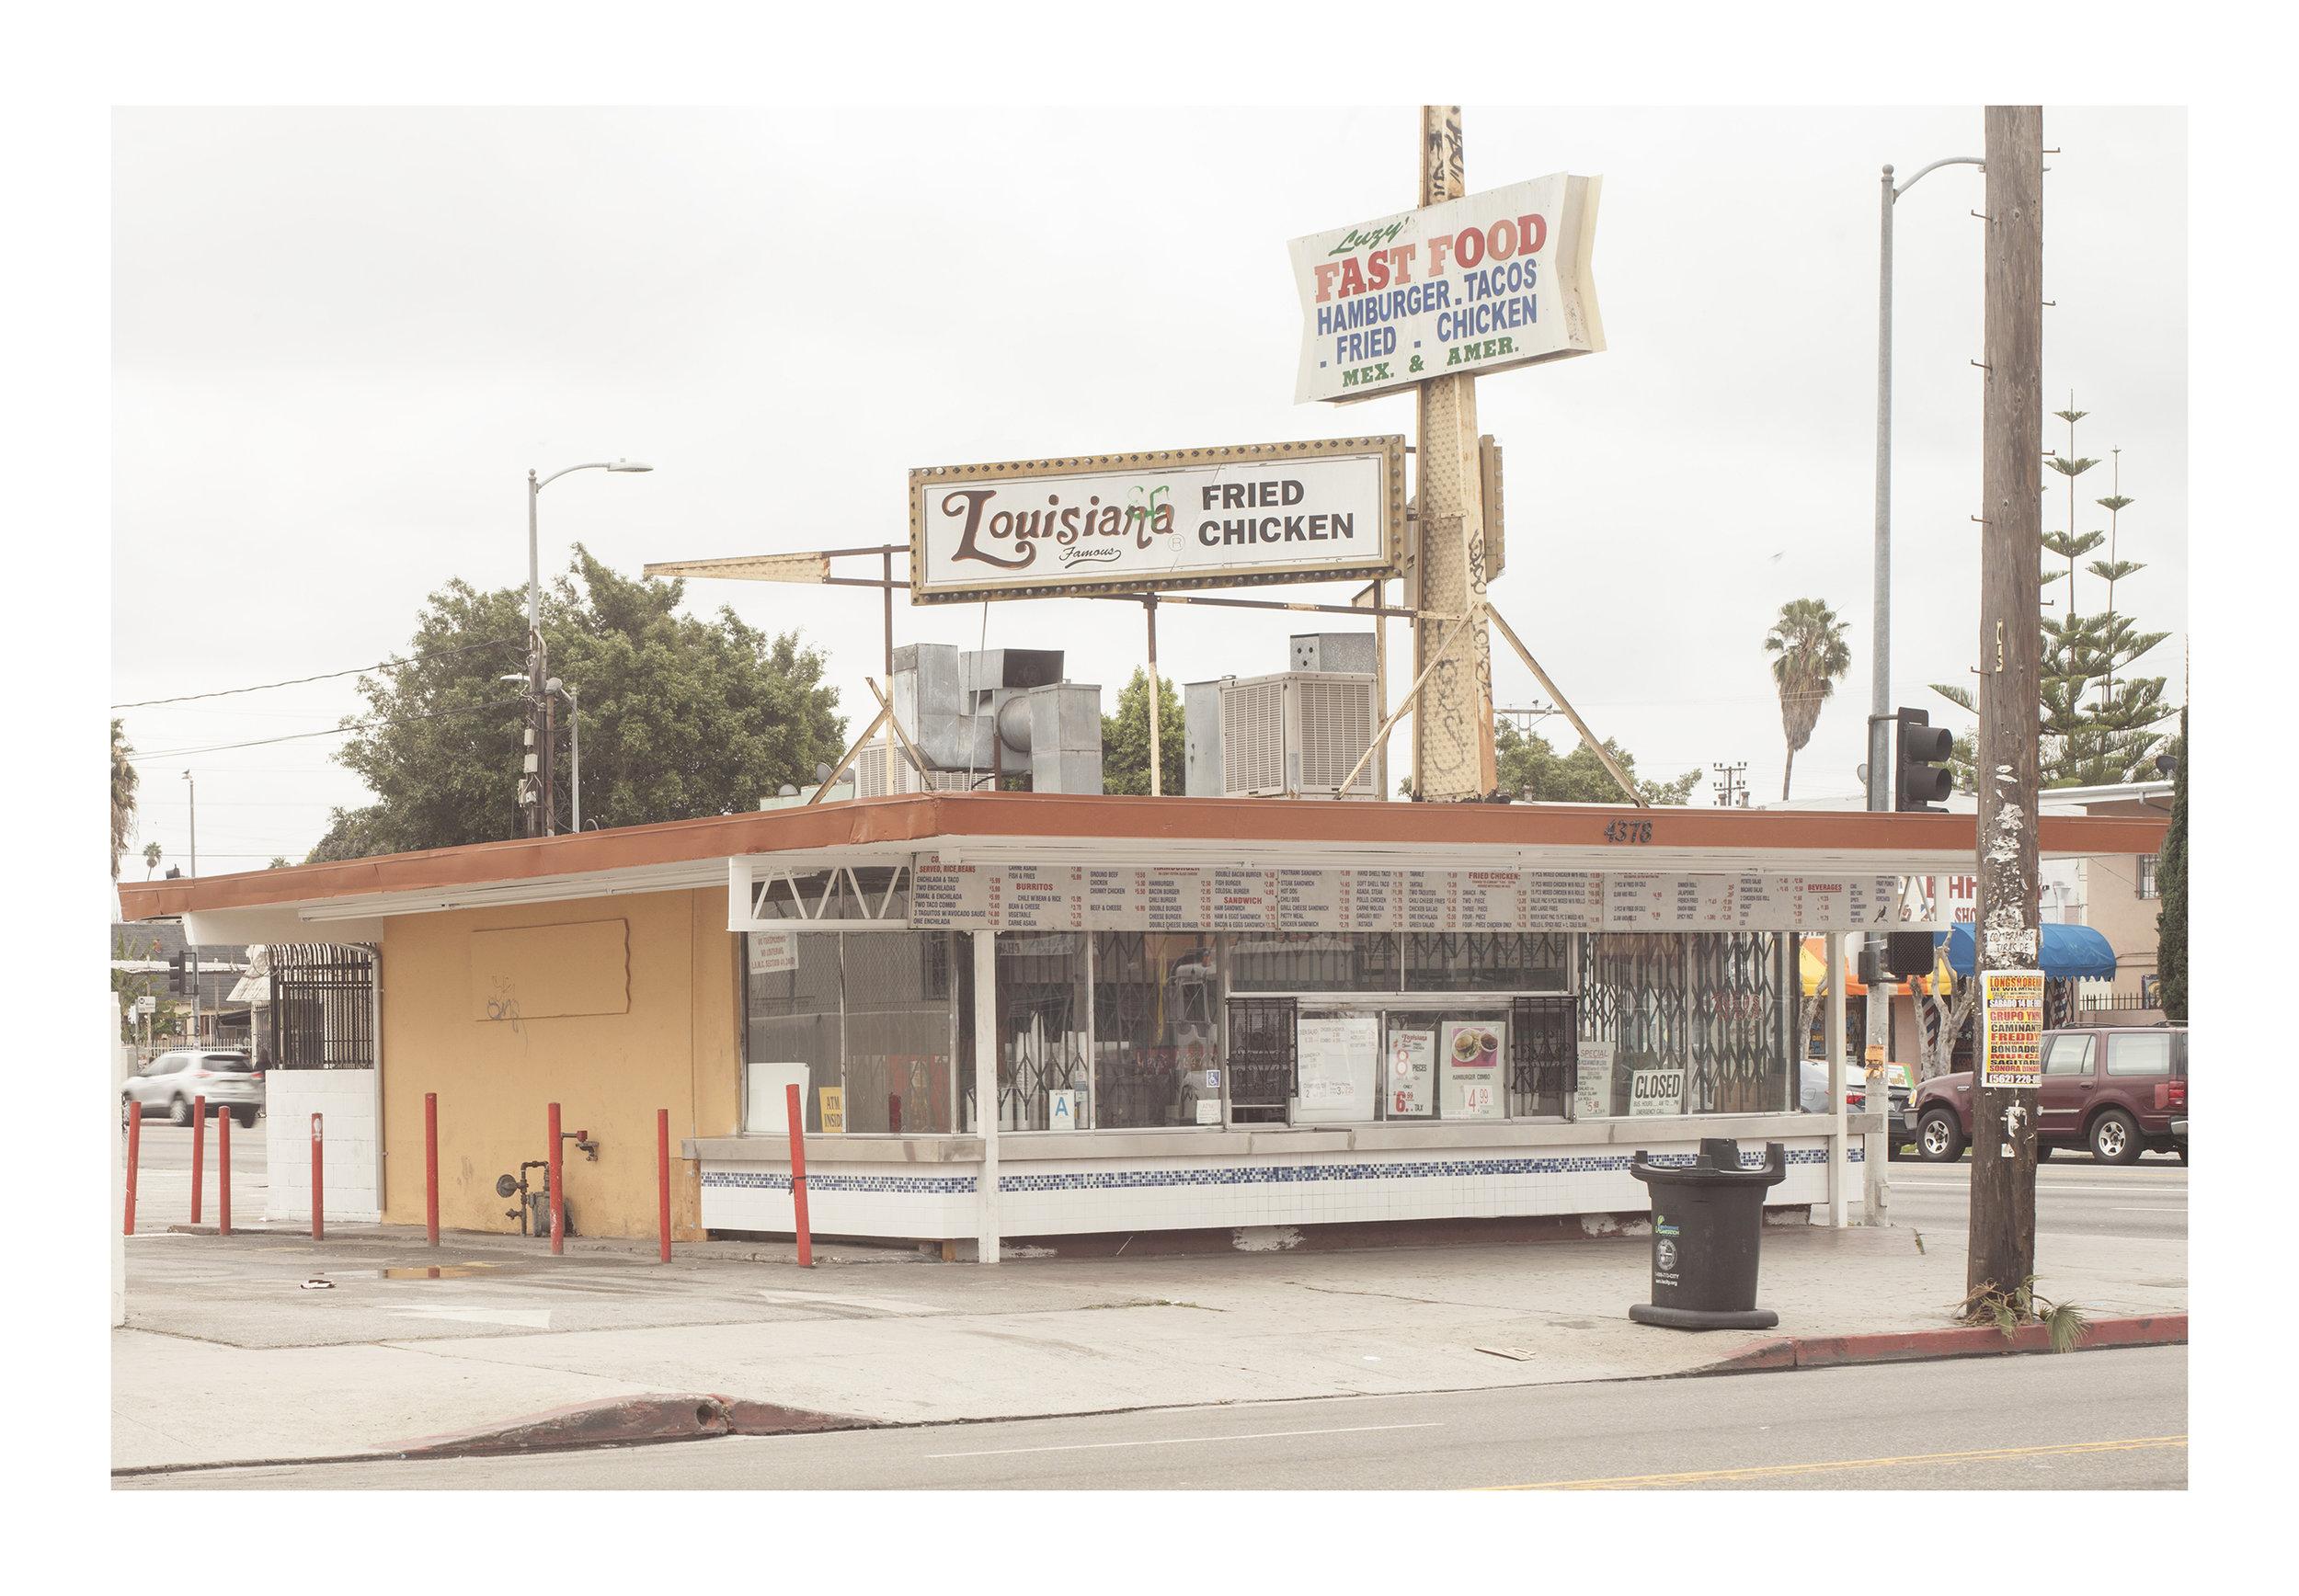 Fast Food Los Angeles, California 2016